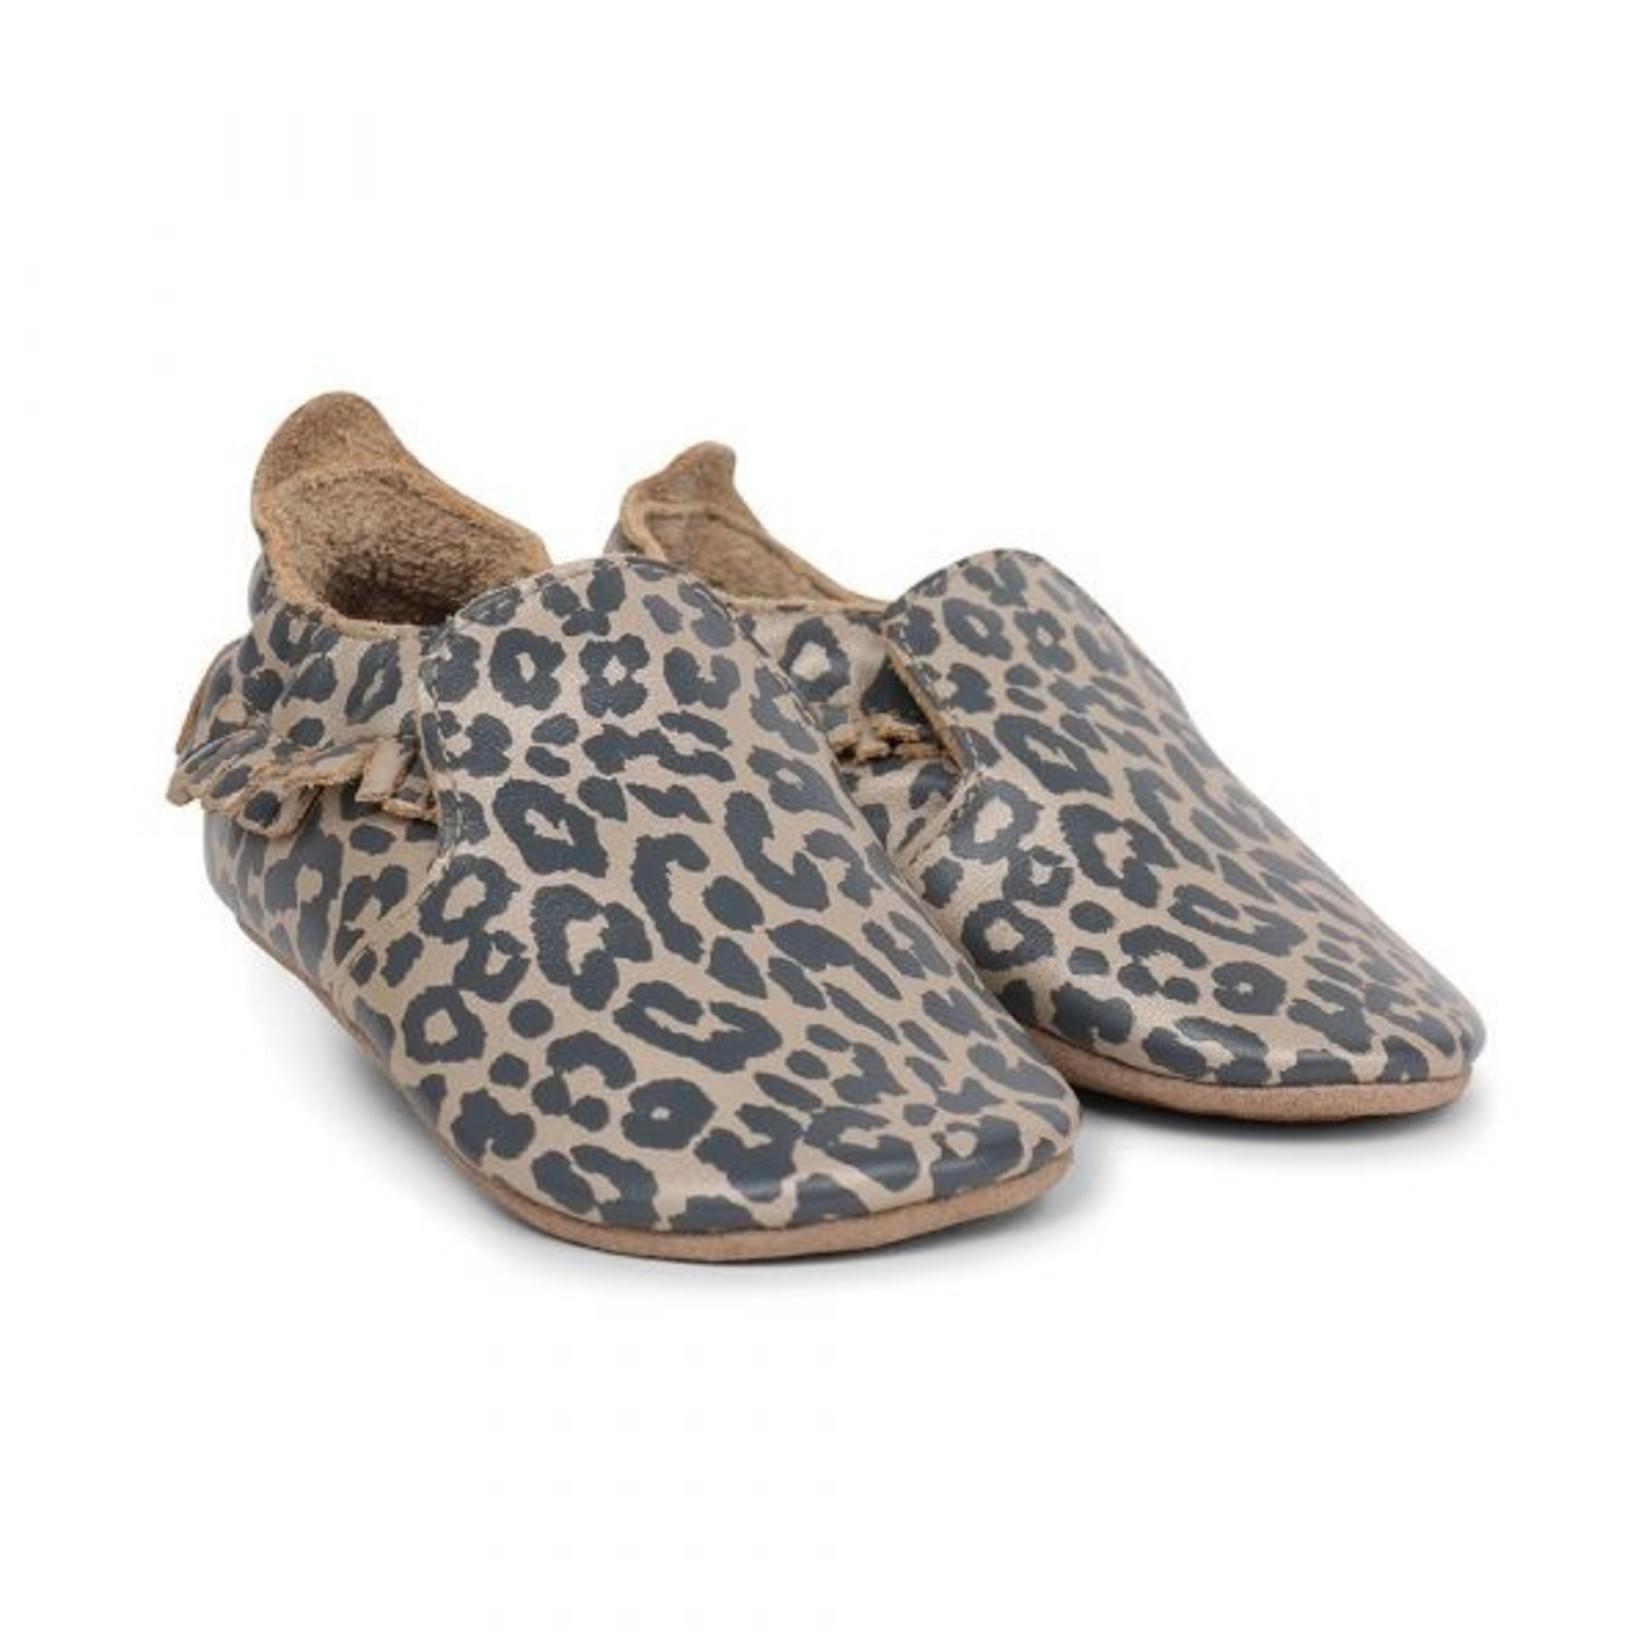 Bobux Bobux Soft soles Gold Leopard print